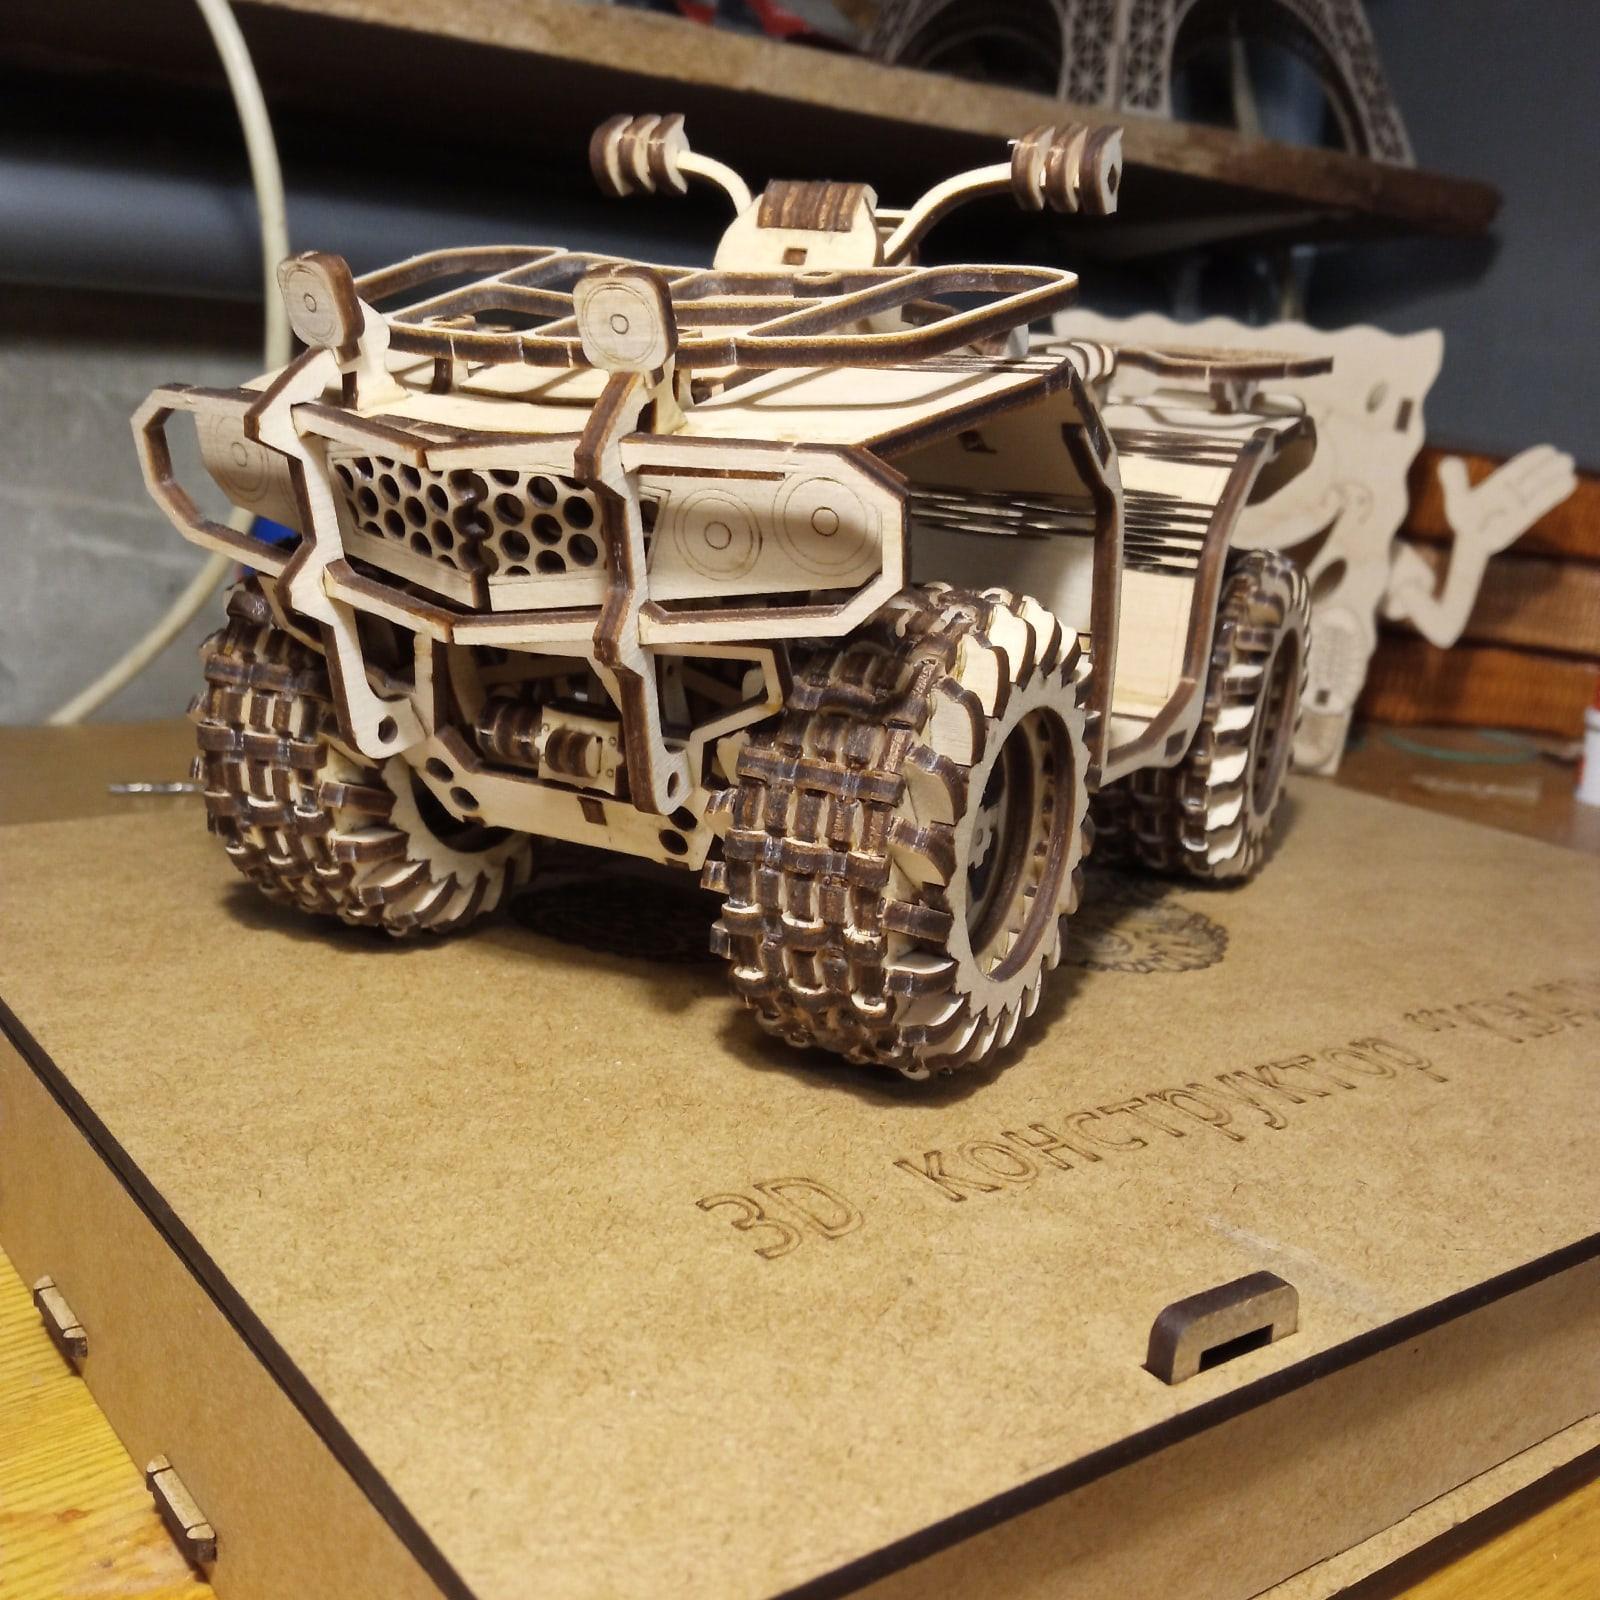 Laser Cut ATV Quad Bike 3D Wooden Puzzle Free Vector